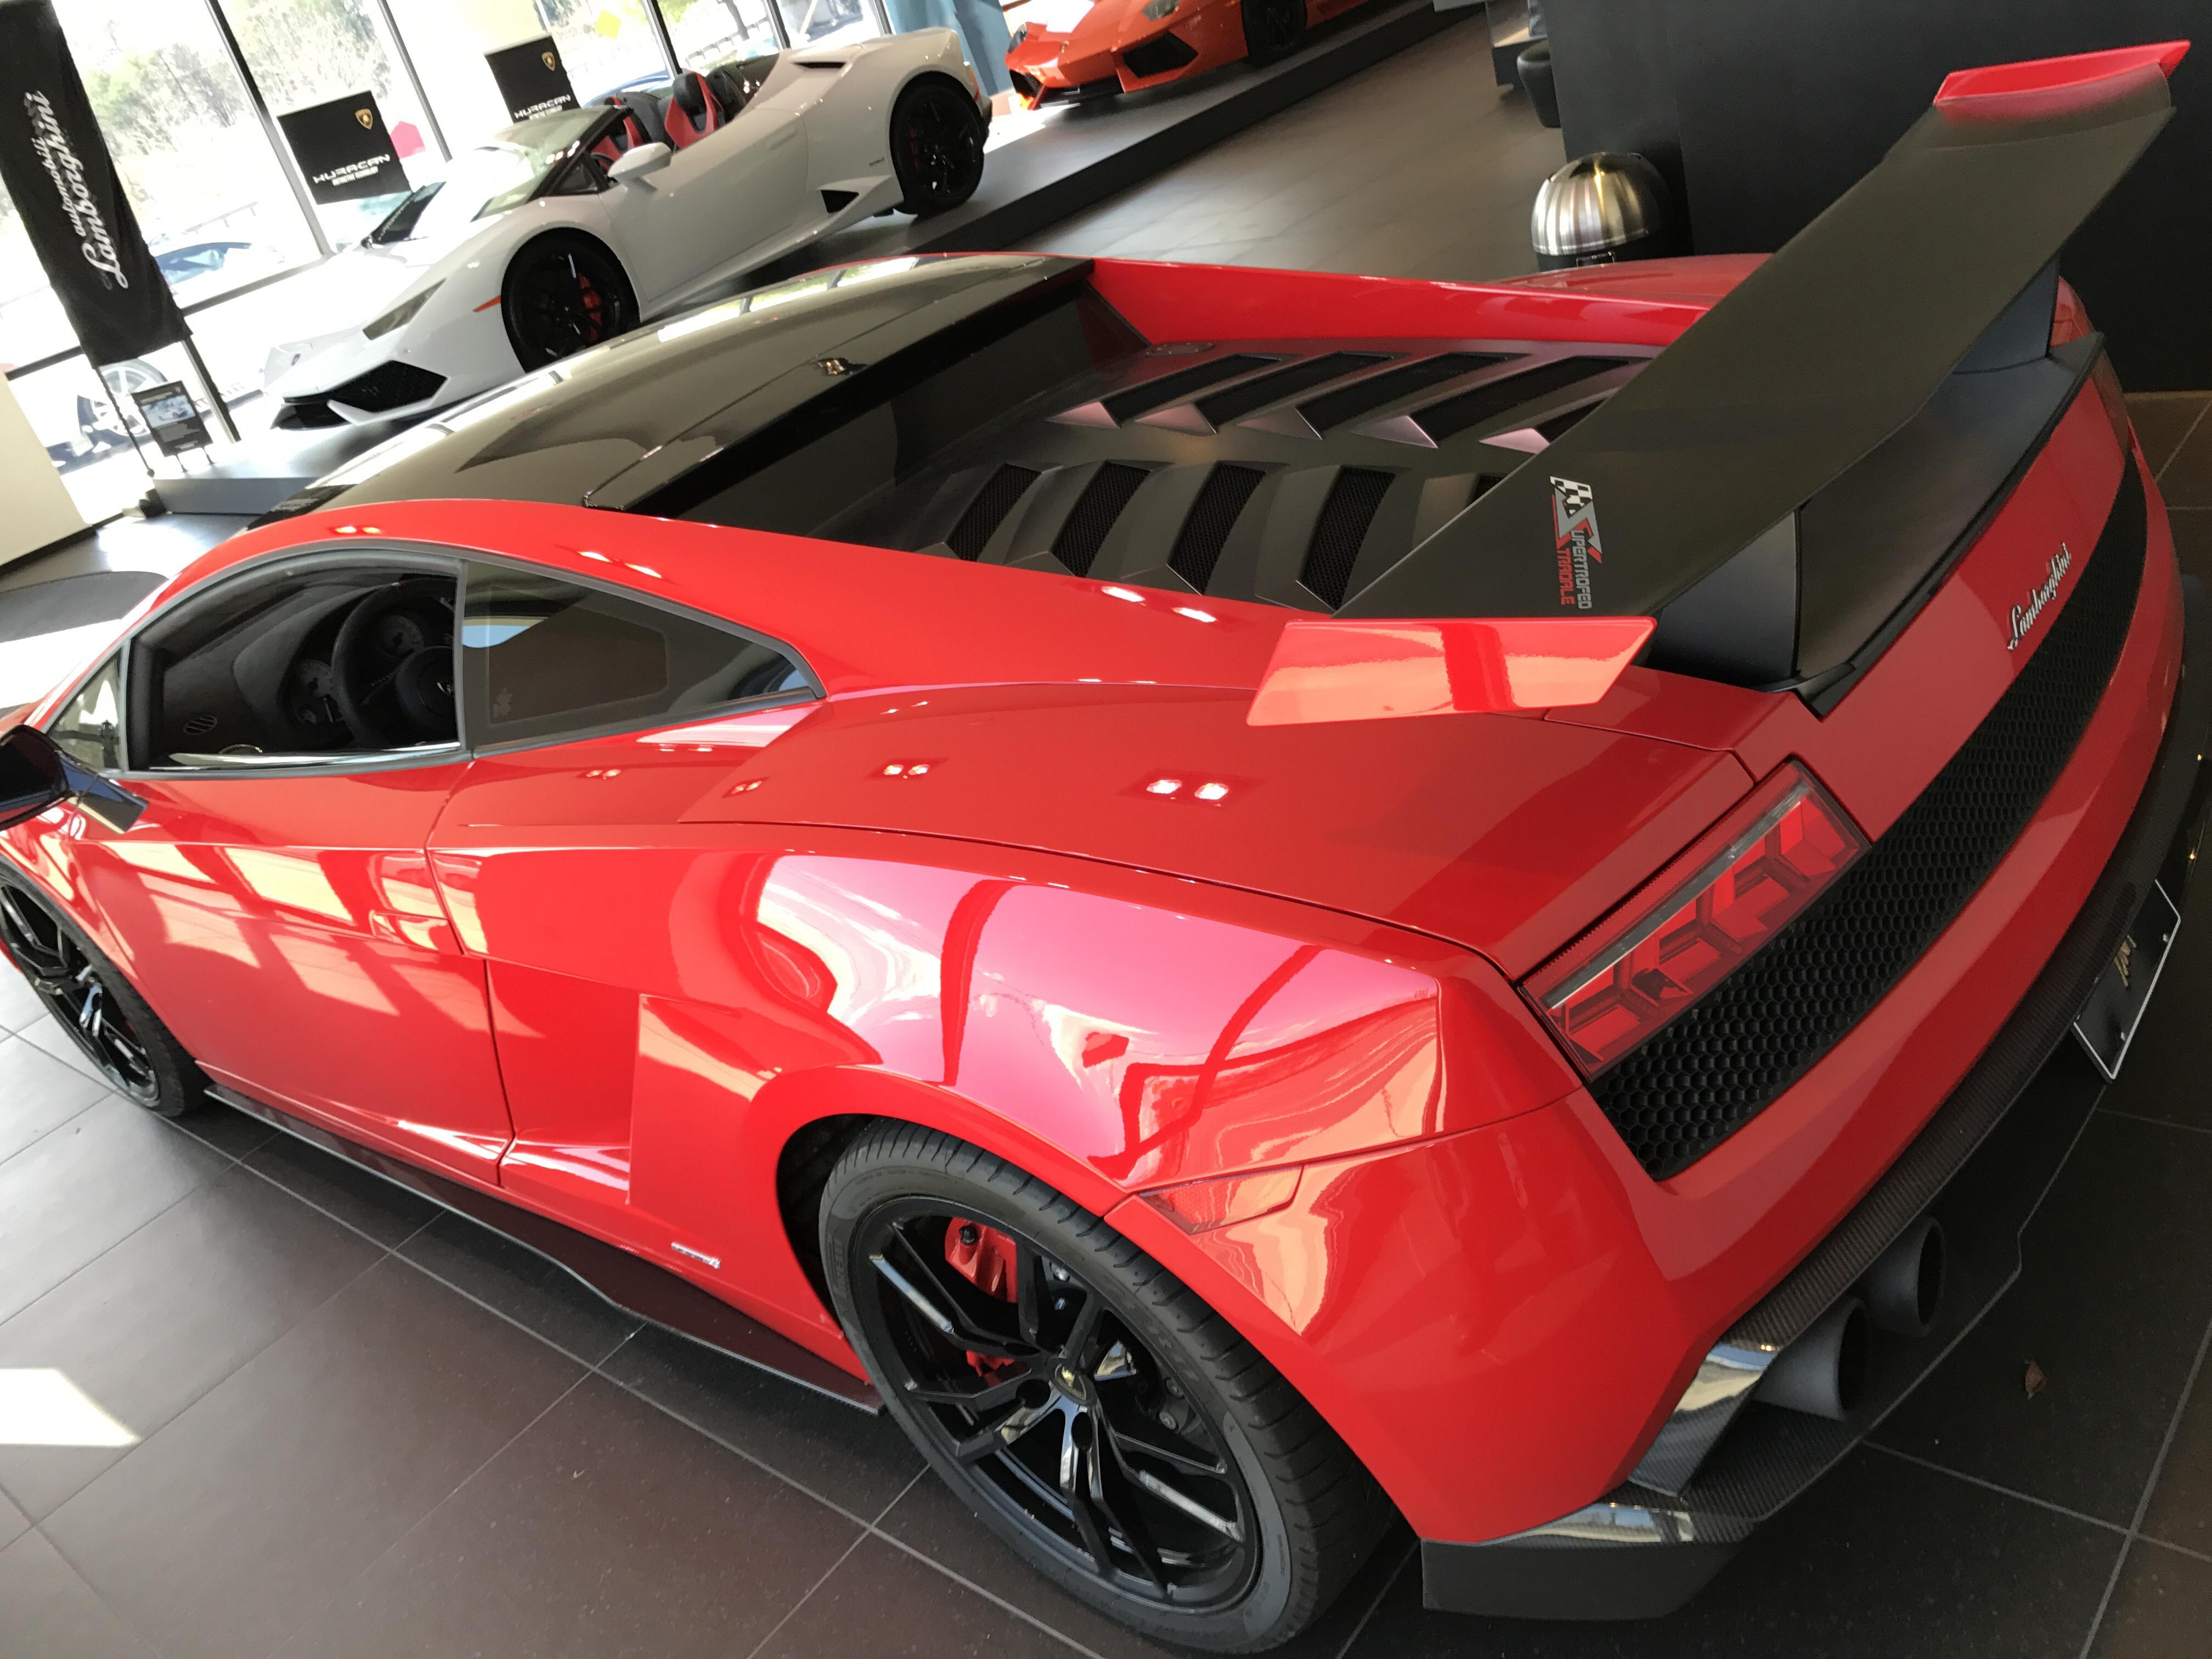 The Lamborghini Gallardo Super Trofeo Stradale The Car Files